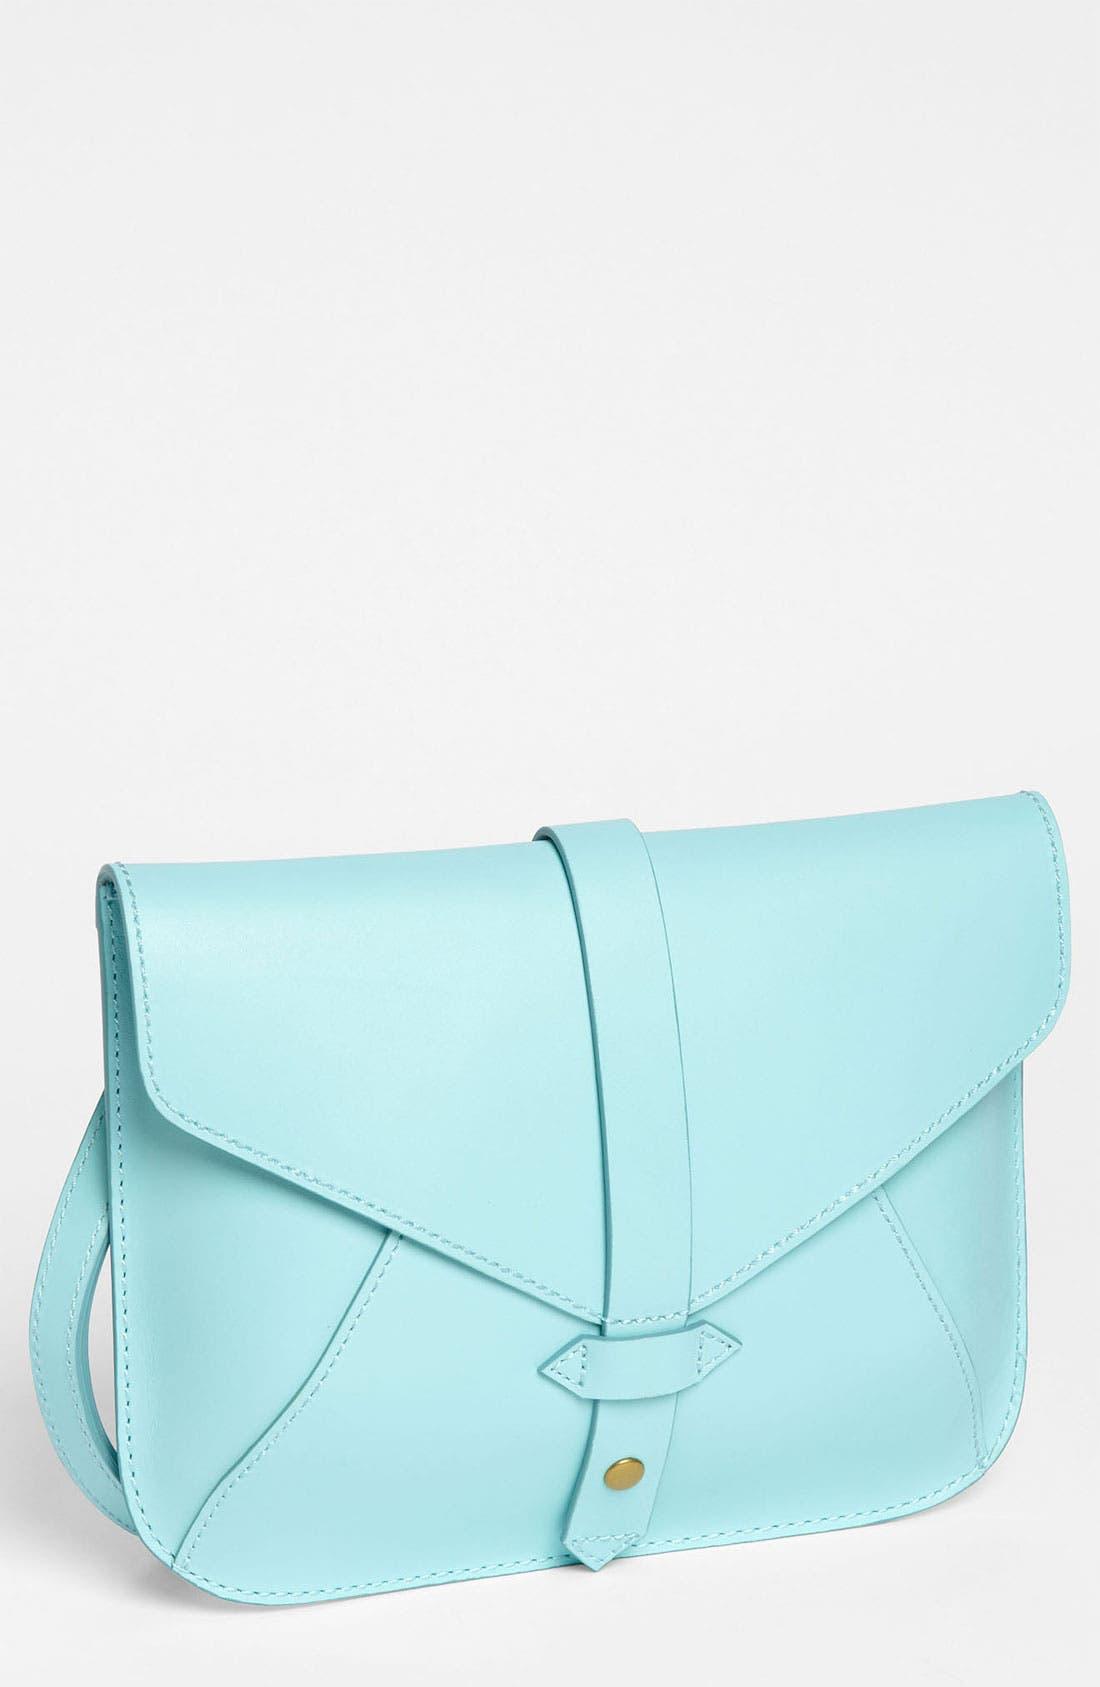 Main Image - IIIBeCa by Joy Gryson 'Church Street' Envelope Crossbody Bag